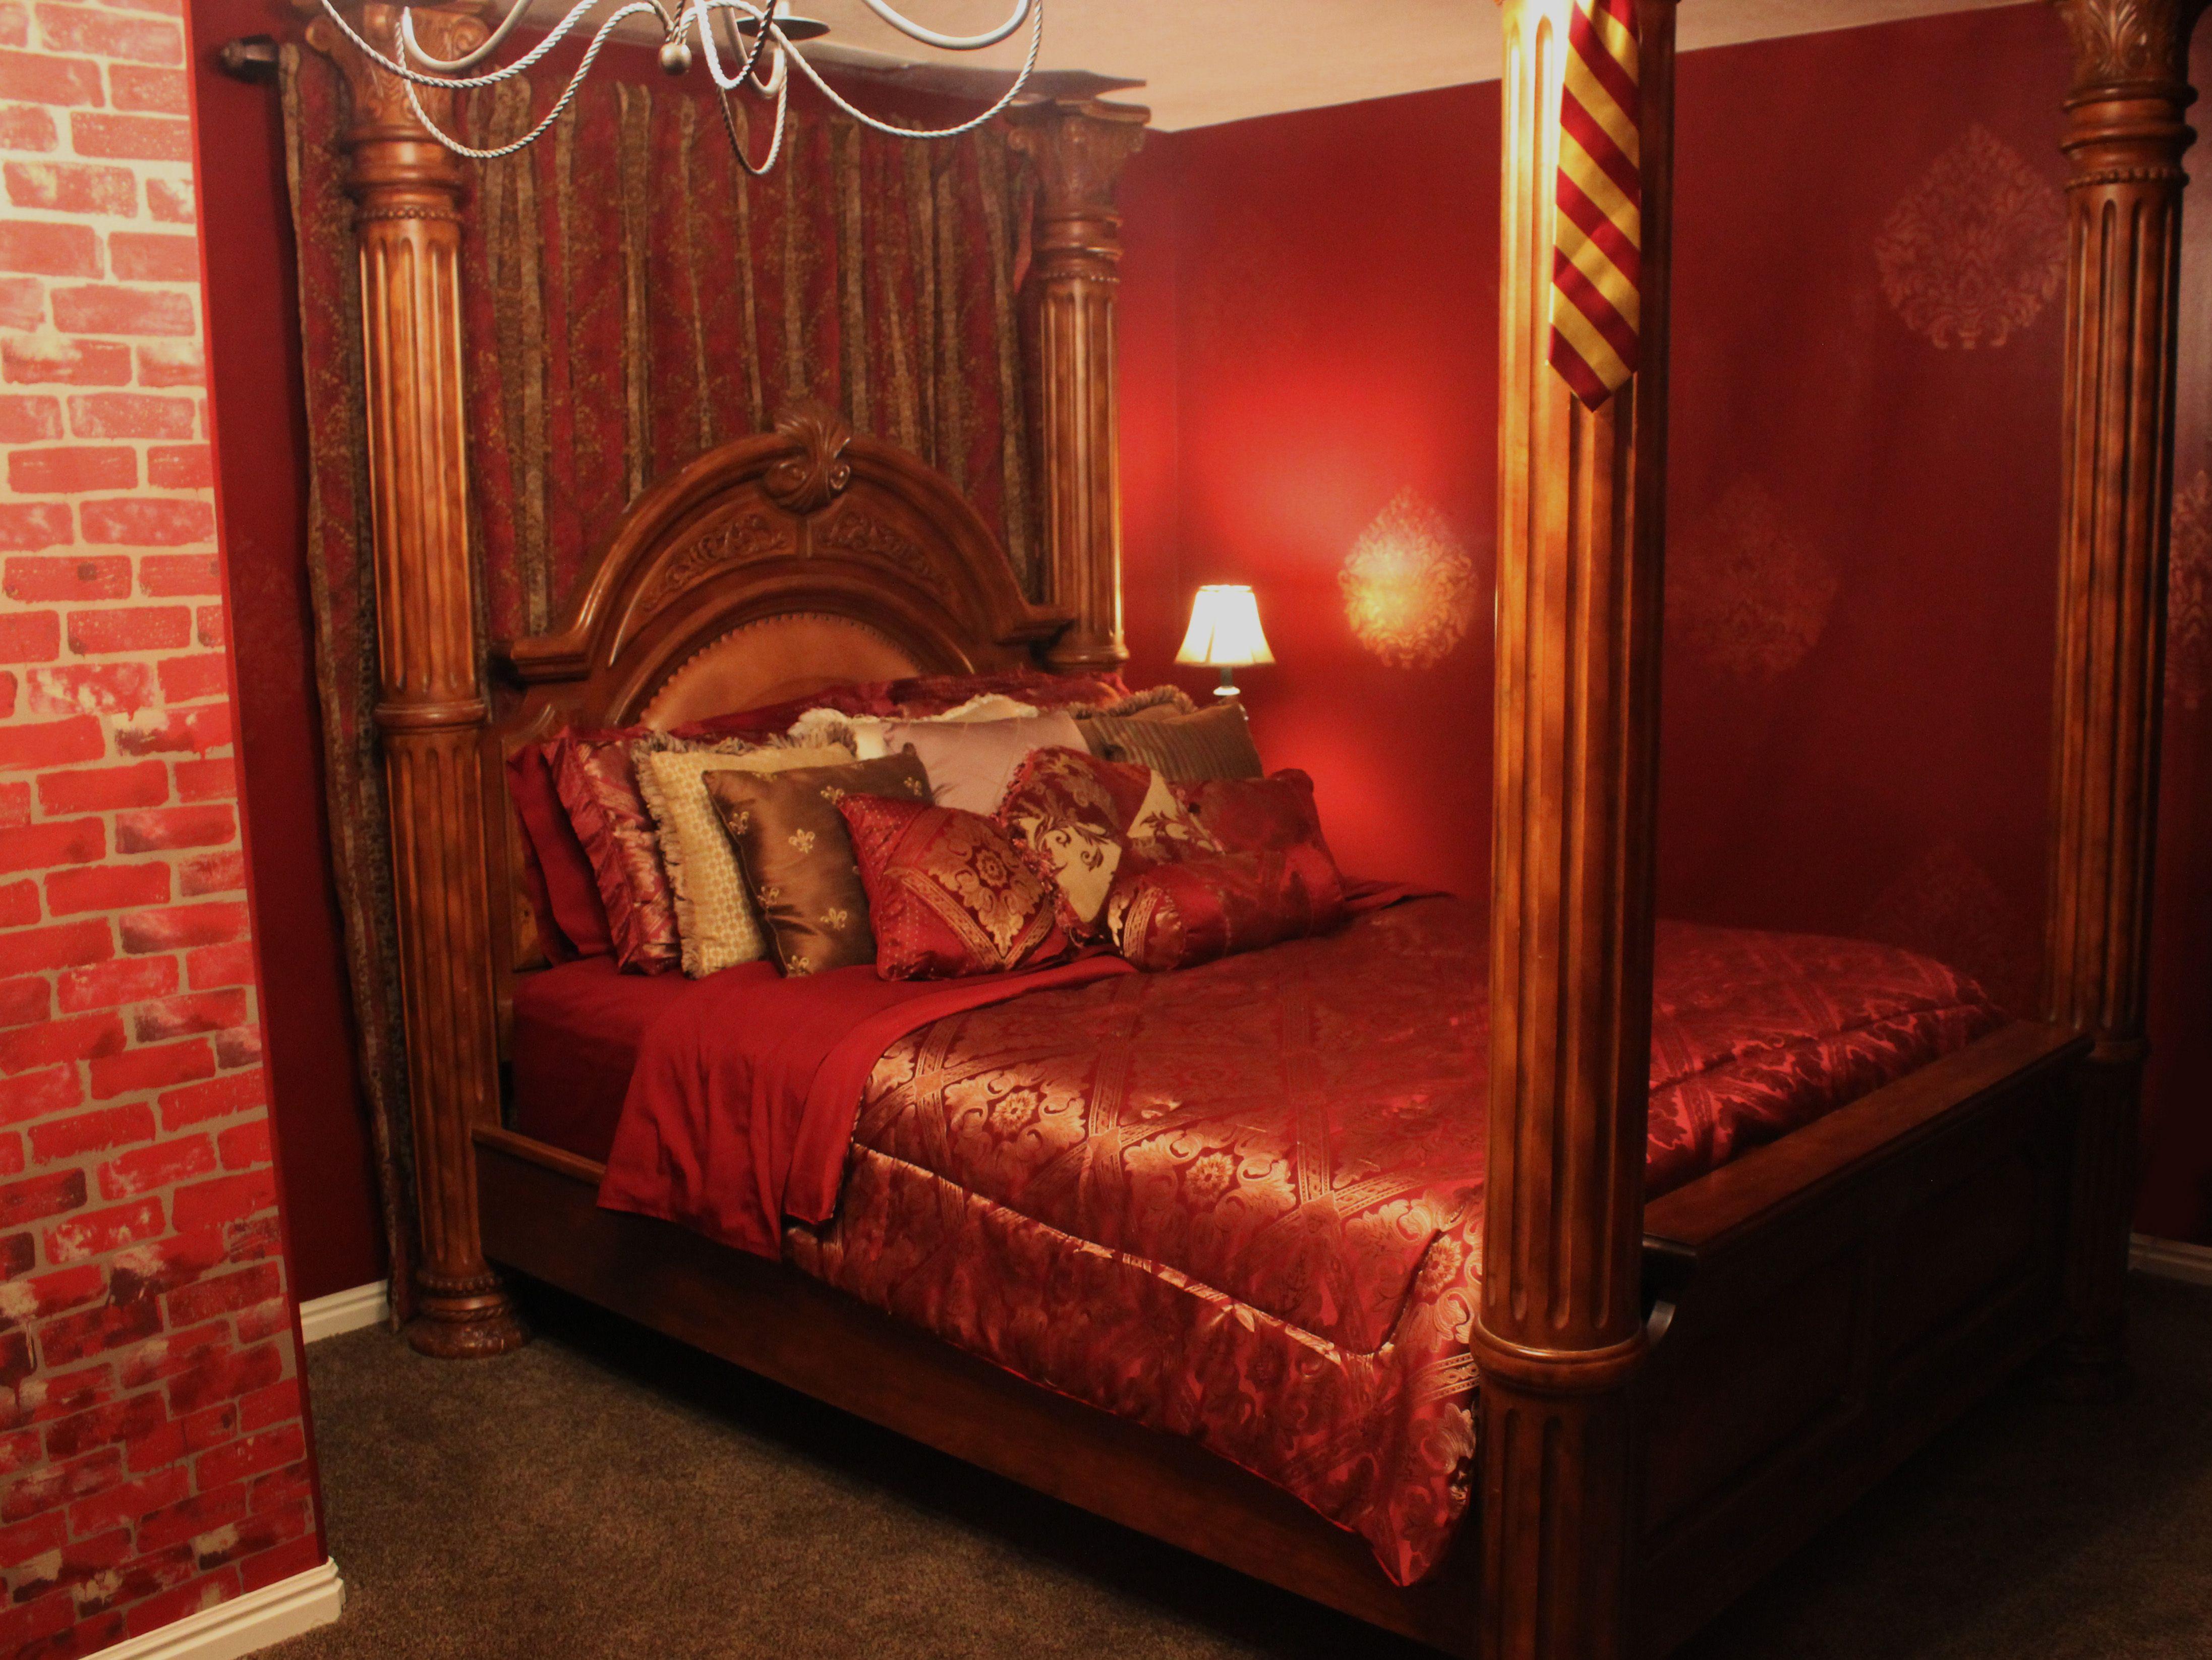 Harry Potter Room Gryffindor Dormitory Four Poster Bed